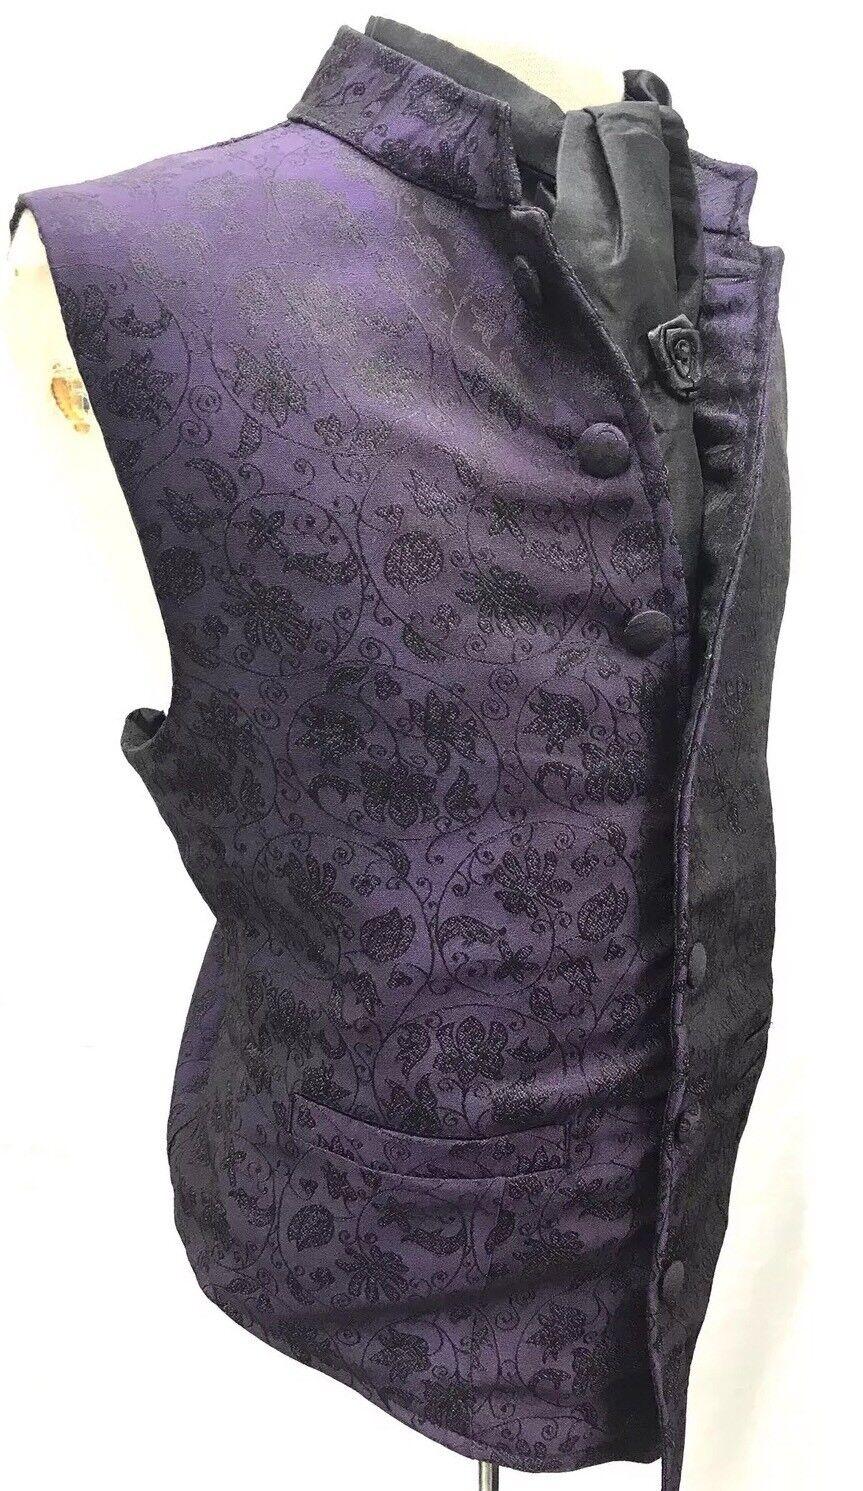 "Halloween Special Raven Romantic Gothic Waistcoat, Cravat Pin Size 40 42"" M"